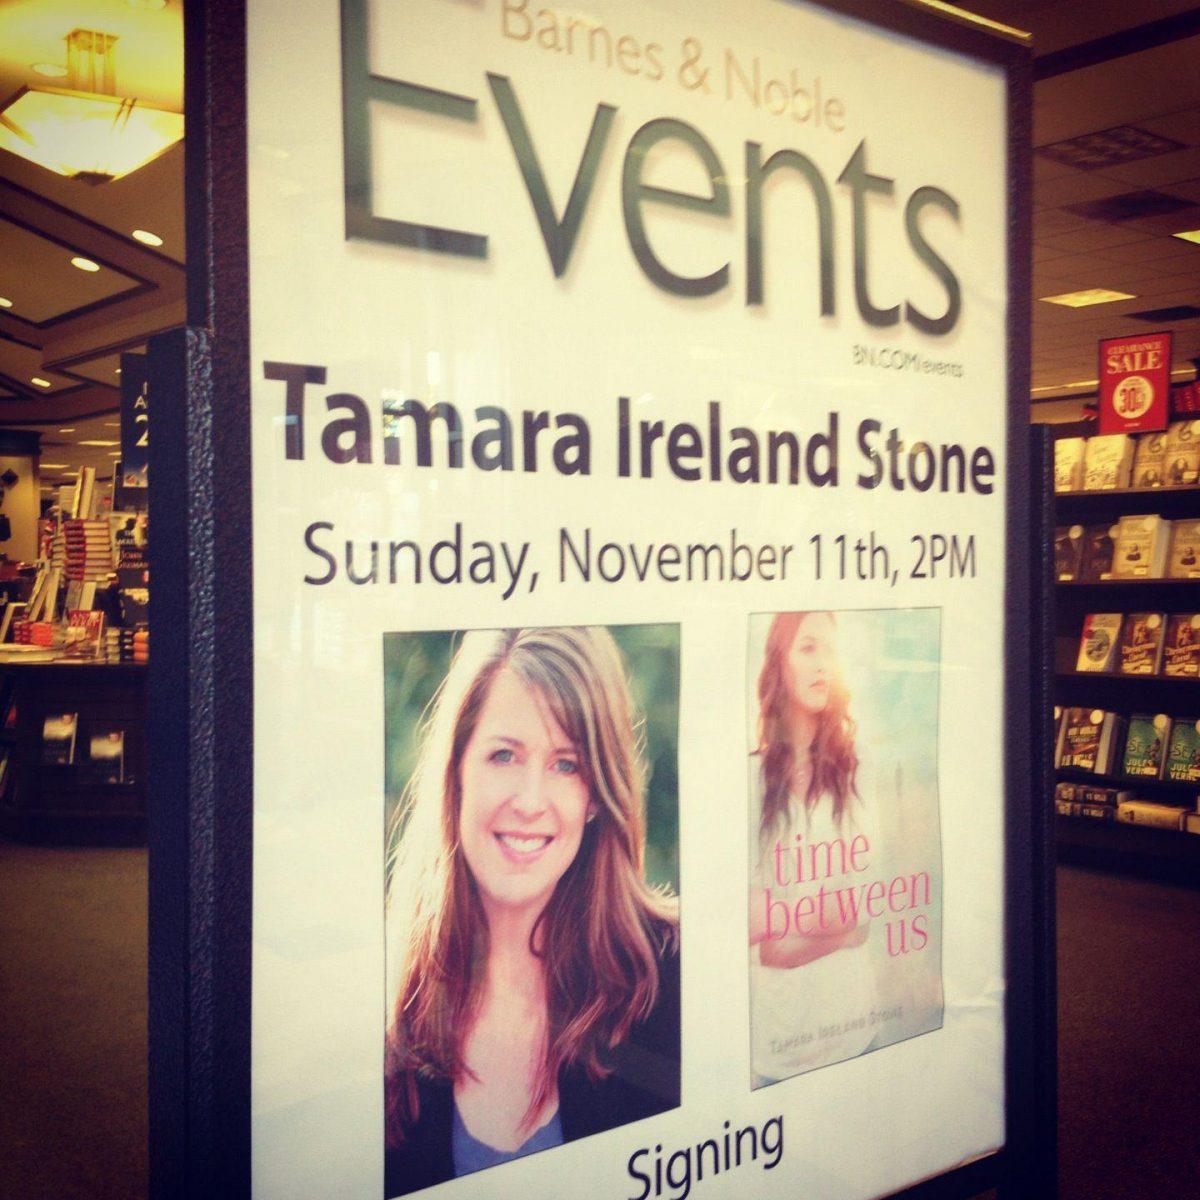 Barnes & Noble - San Jose, CA - Nov. 2012